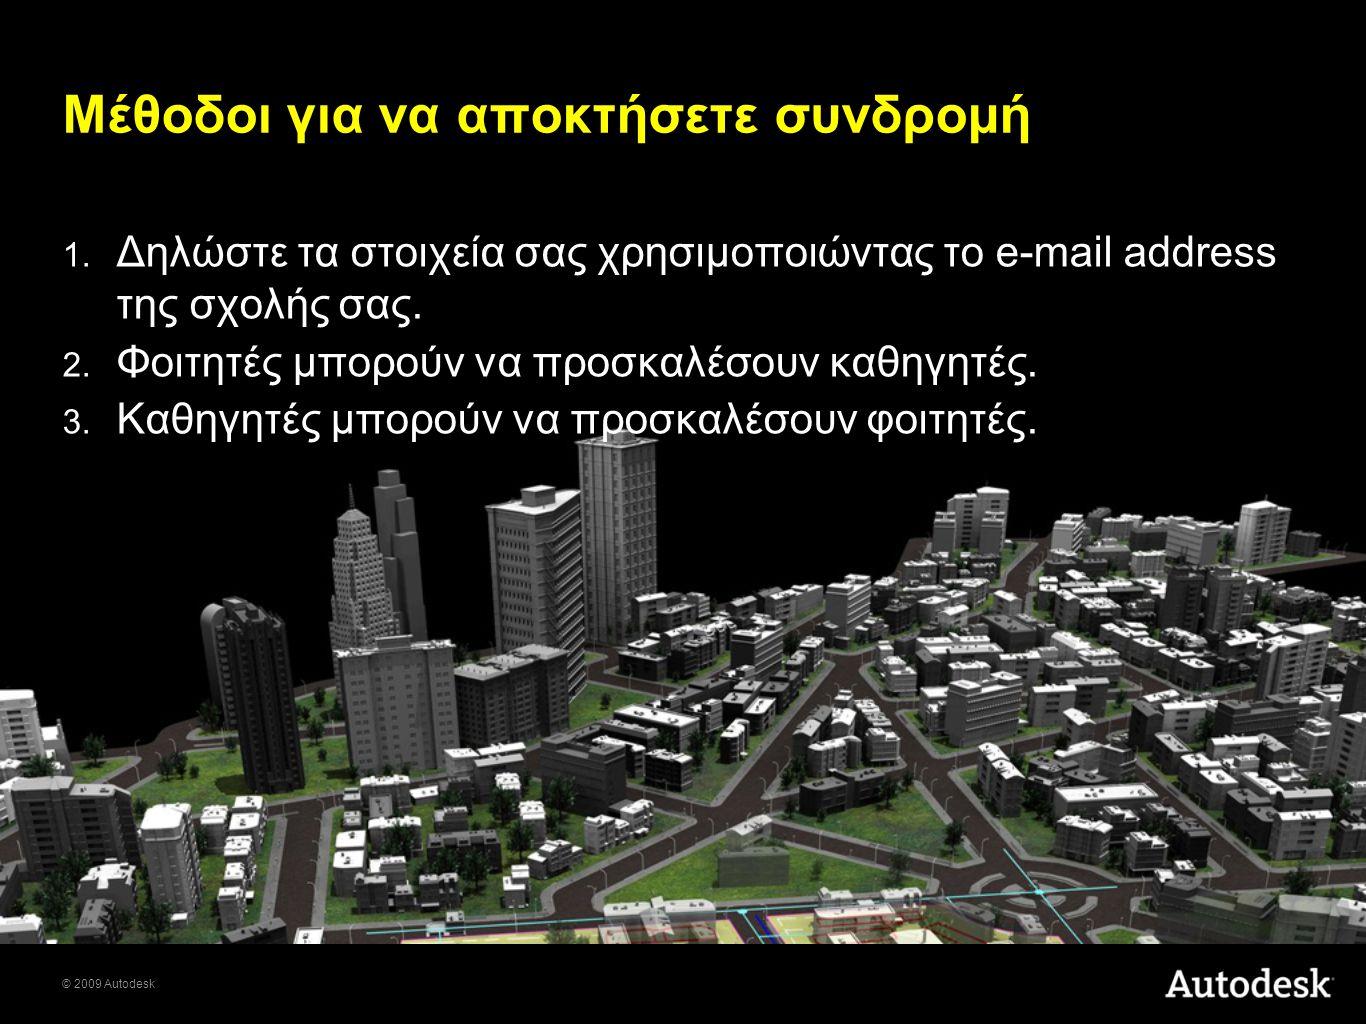 © 2009 Autodesk Μέθοδοι για να αποκτήσετε συνδρομή 1. Δηλώστε τα στοιχεία σας χρησιμοποιώντας το e-mail address της σχολής σας. 2. Φοιτητές μπορούν να